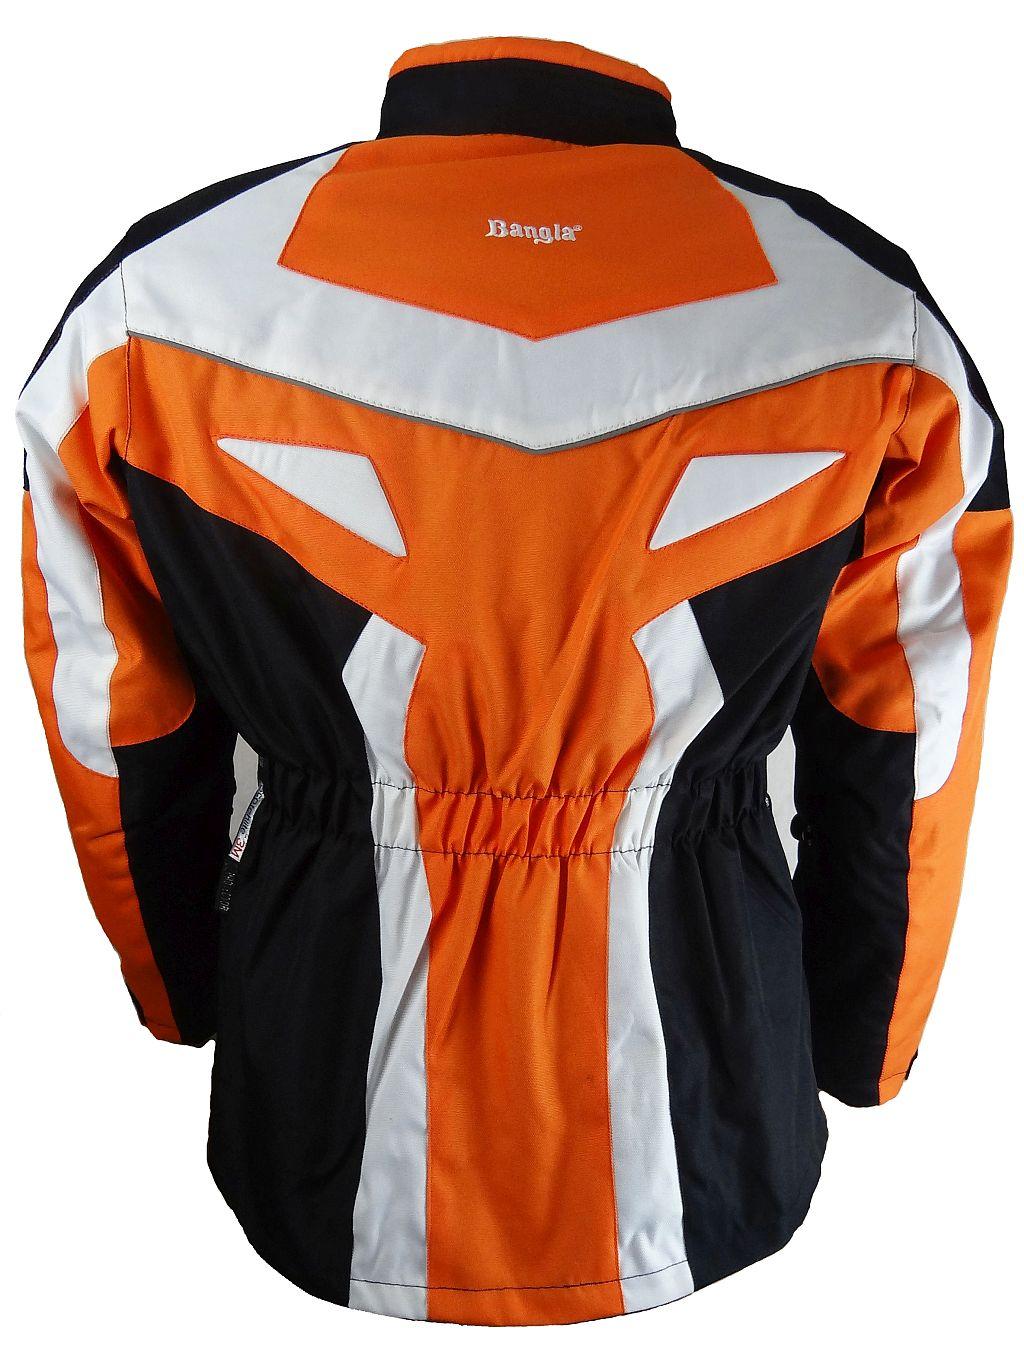 Kinder Motorradjacke Motorrad Textil Jacke Cordura orange schwarz weiss 128-176